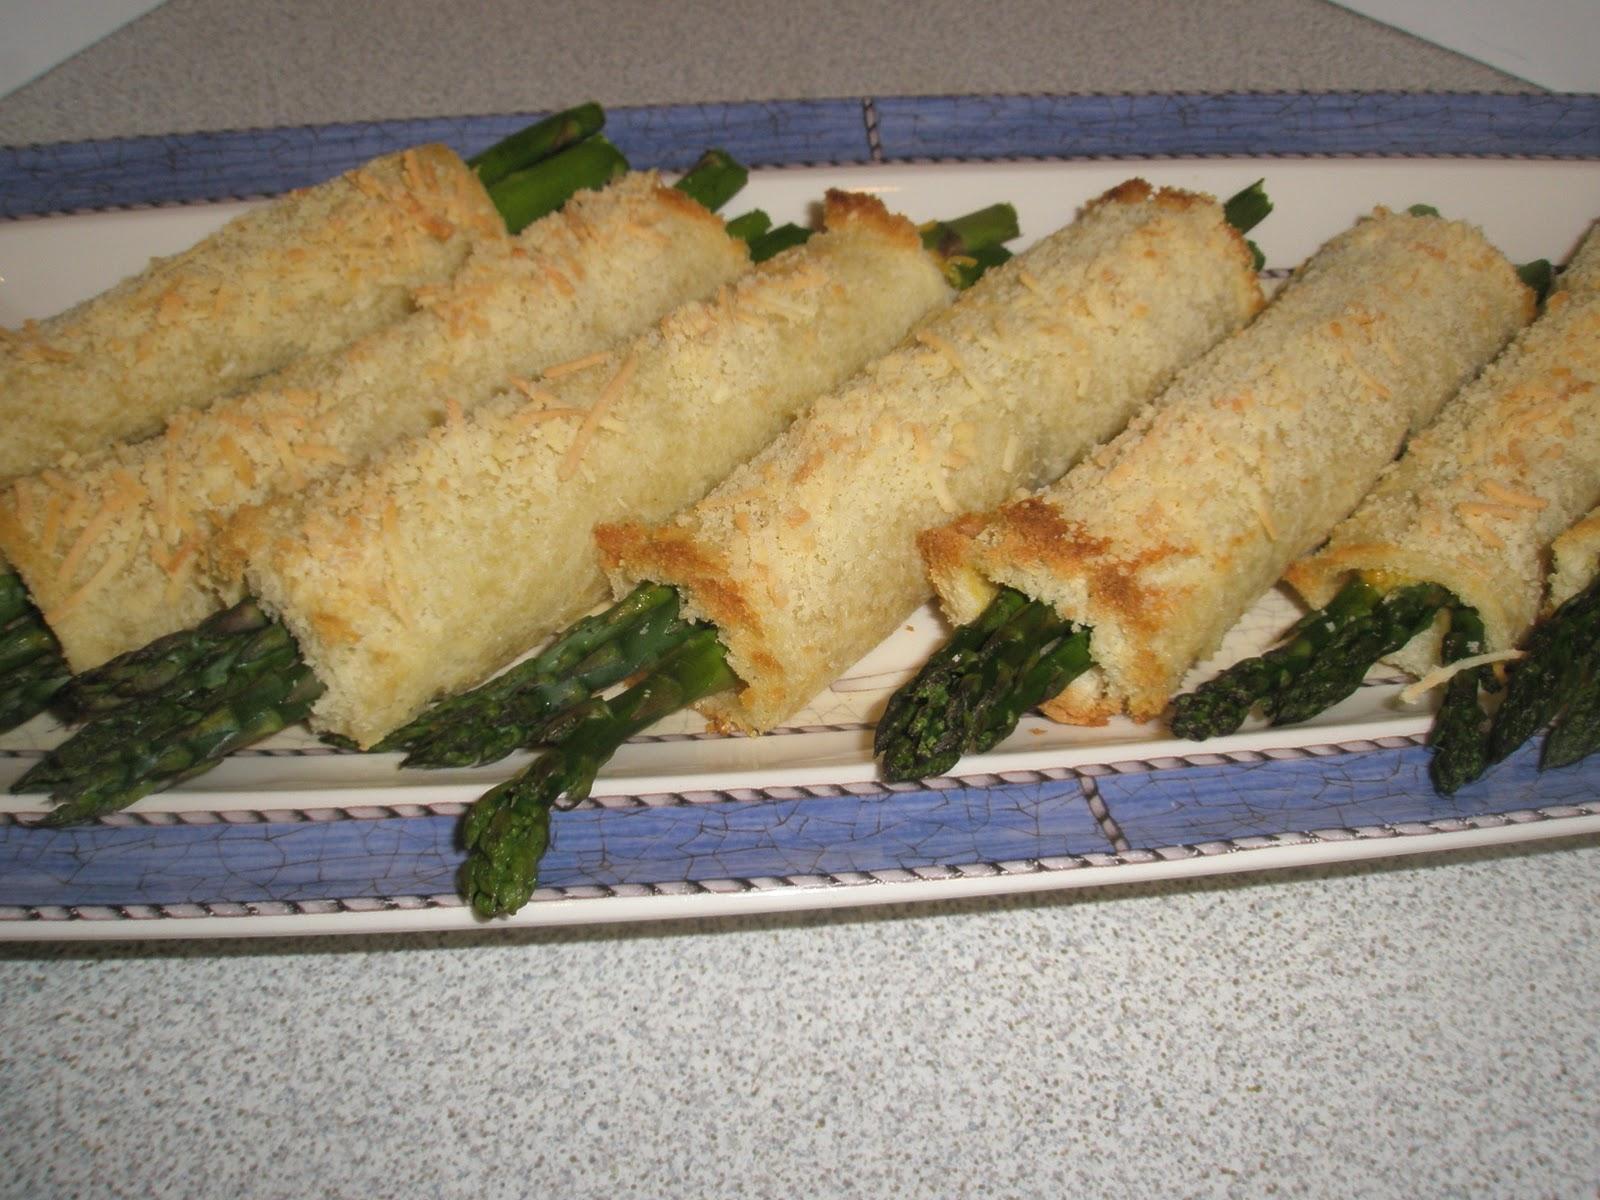 Got it cook it asparagus rolls asparagus rolls ccuart Image collections